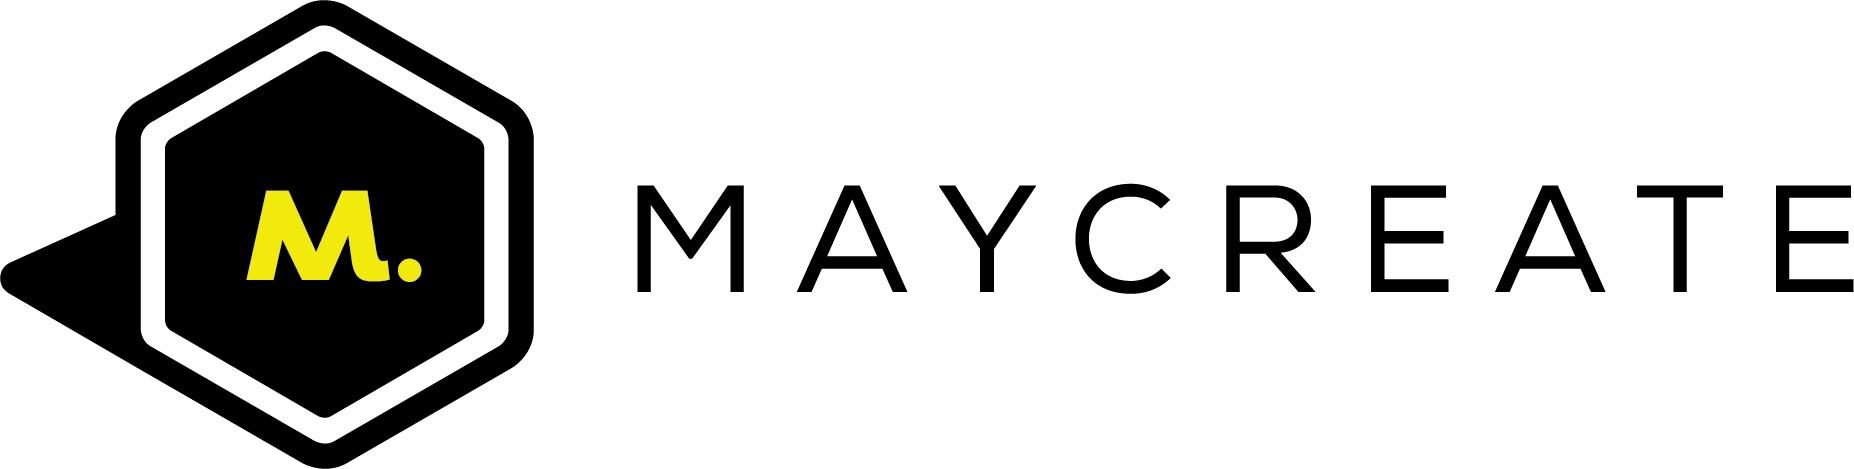 Maycreate Sponsor Logo